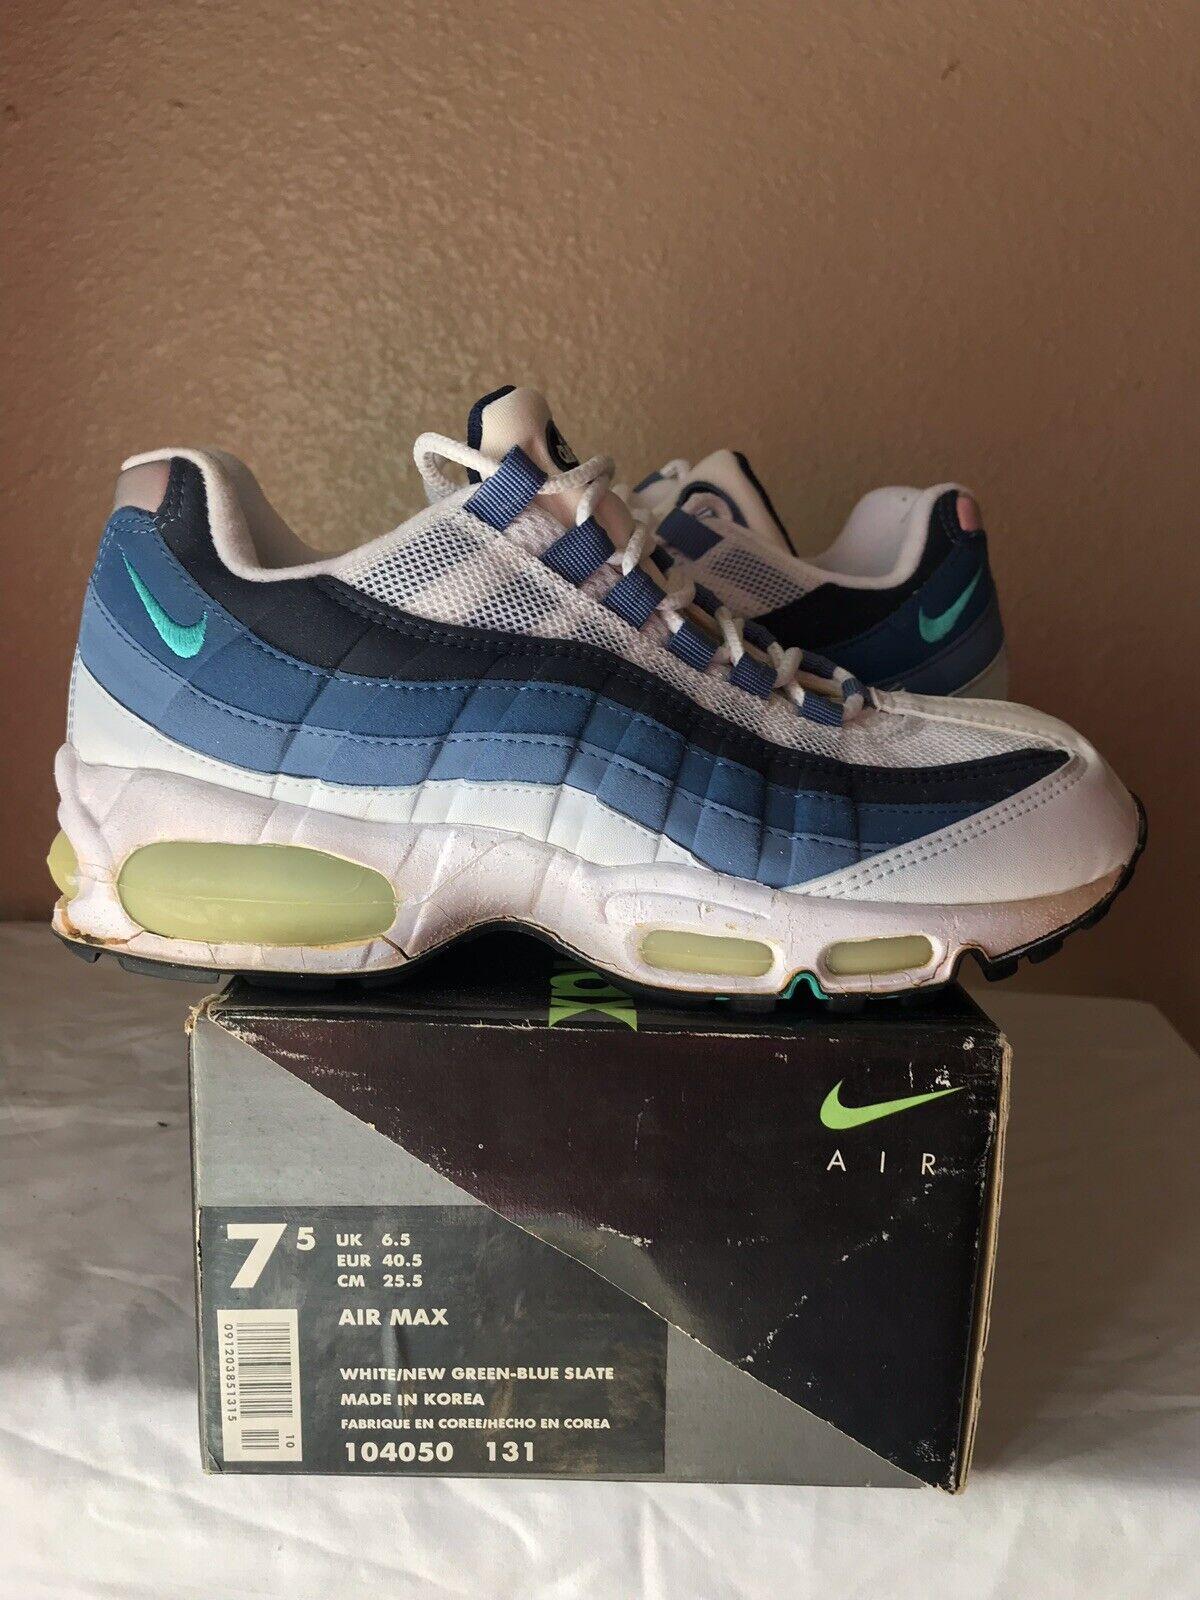 DS 1995 Nike Air Max 95 OG Original Size 7.5 7.5 7.5 White New Green bluee Slate 99 1999 c39259